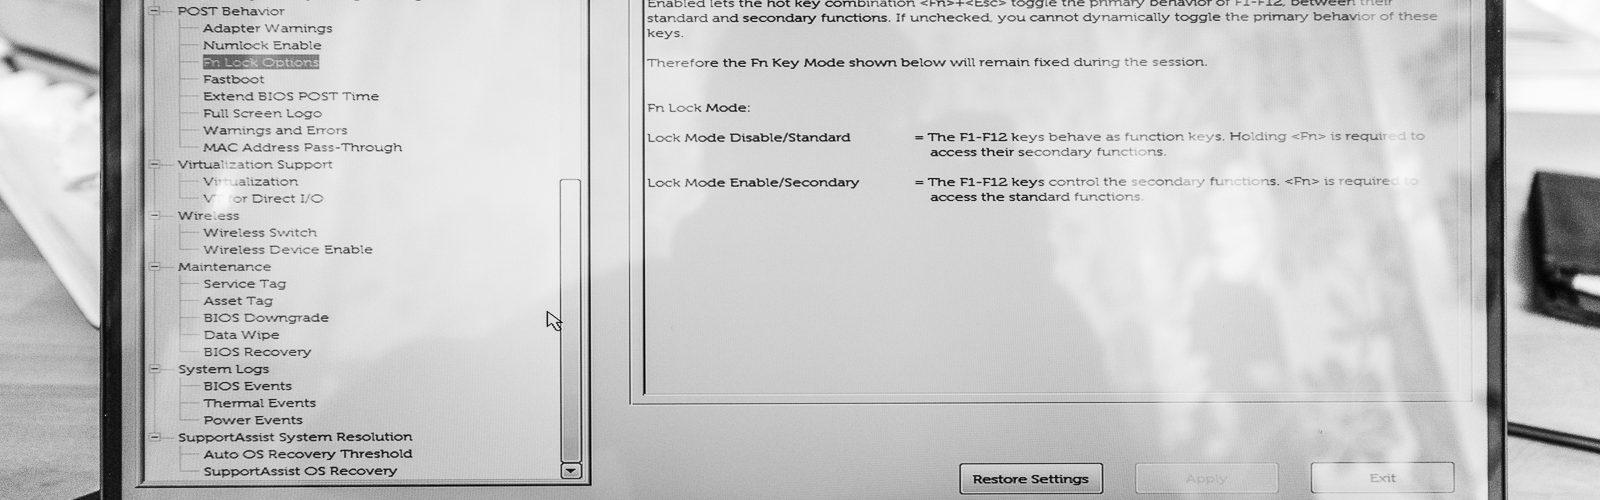 Dell XPS 13 Bios